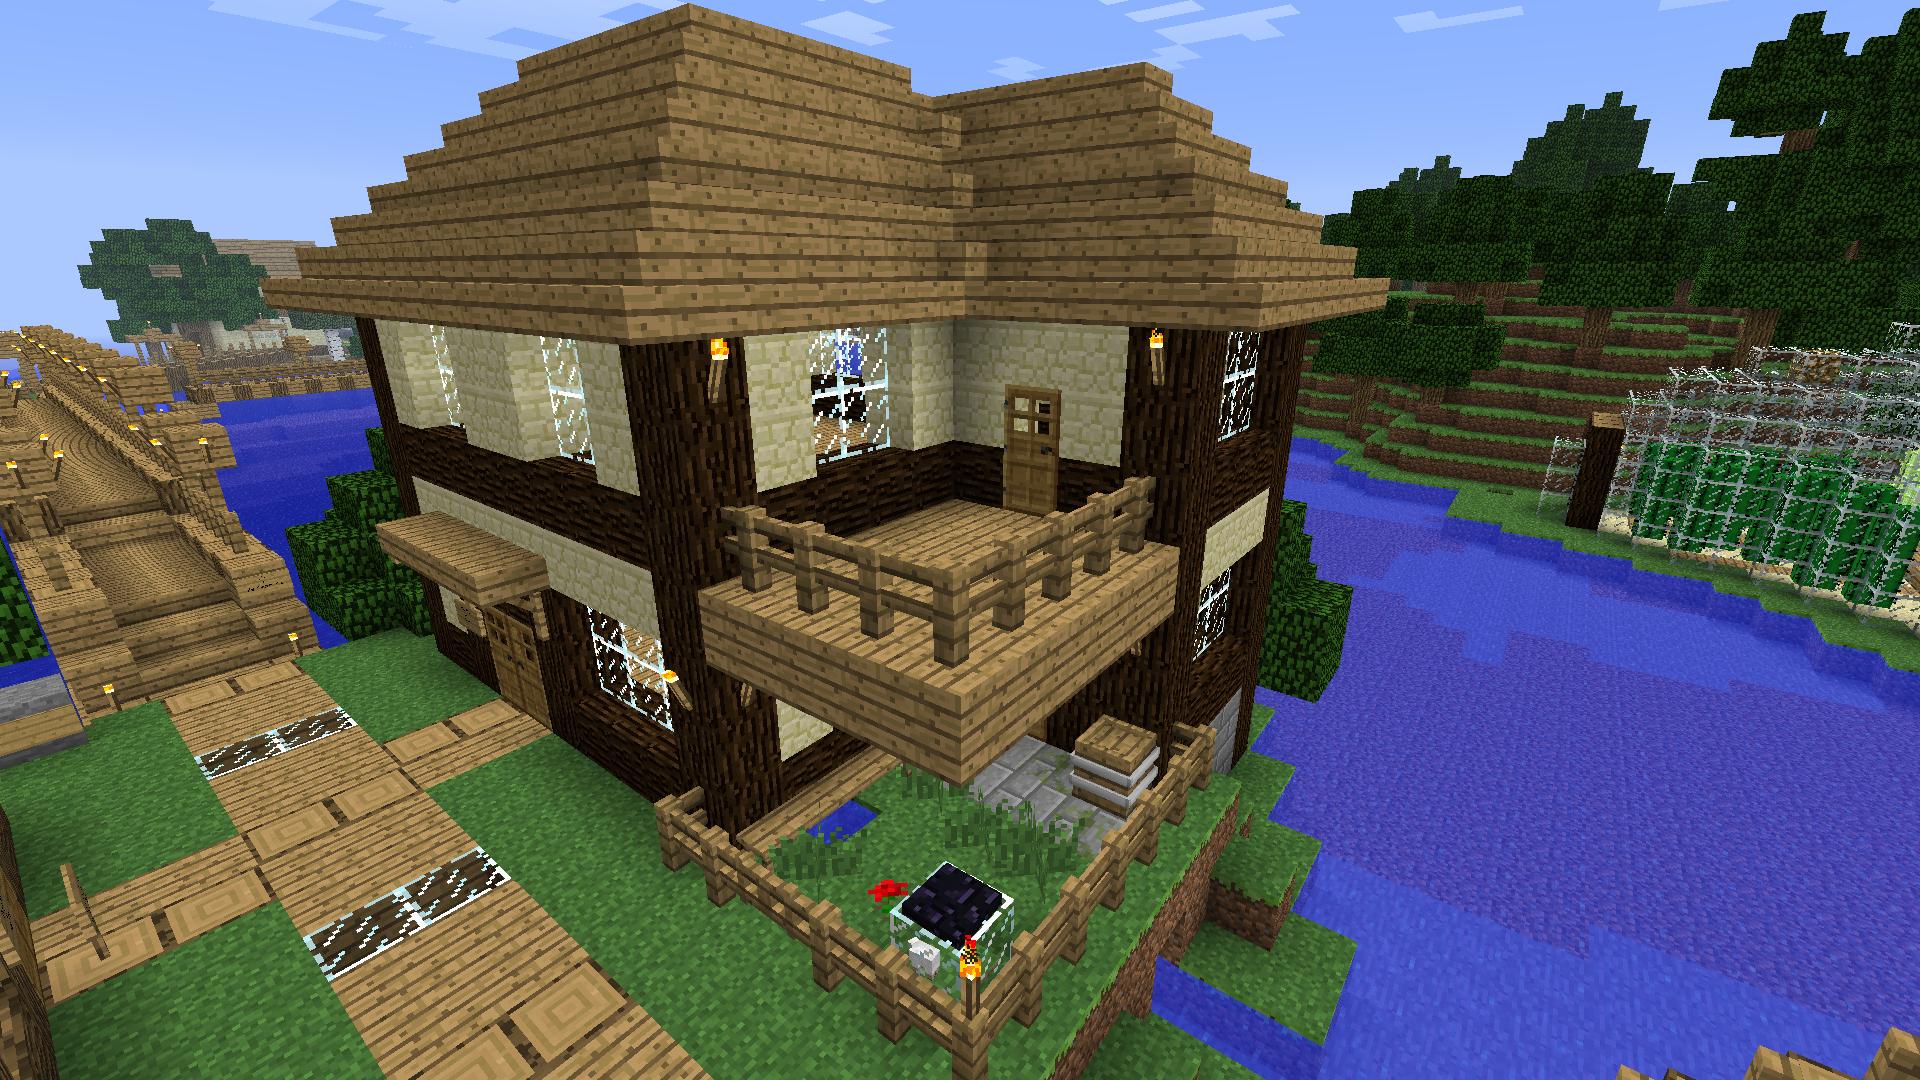 Plan Maison Minecraft Plan Maison Plan Maison Plan